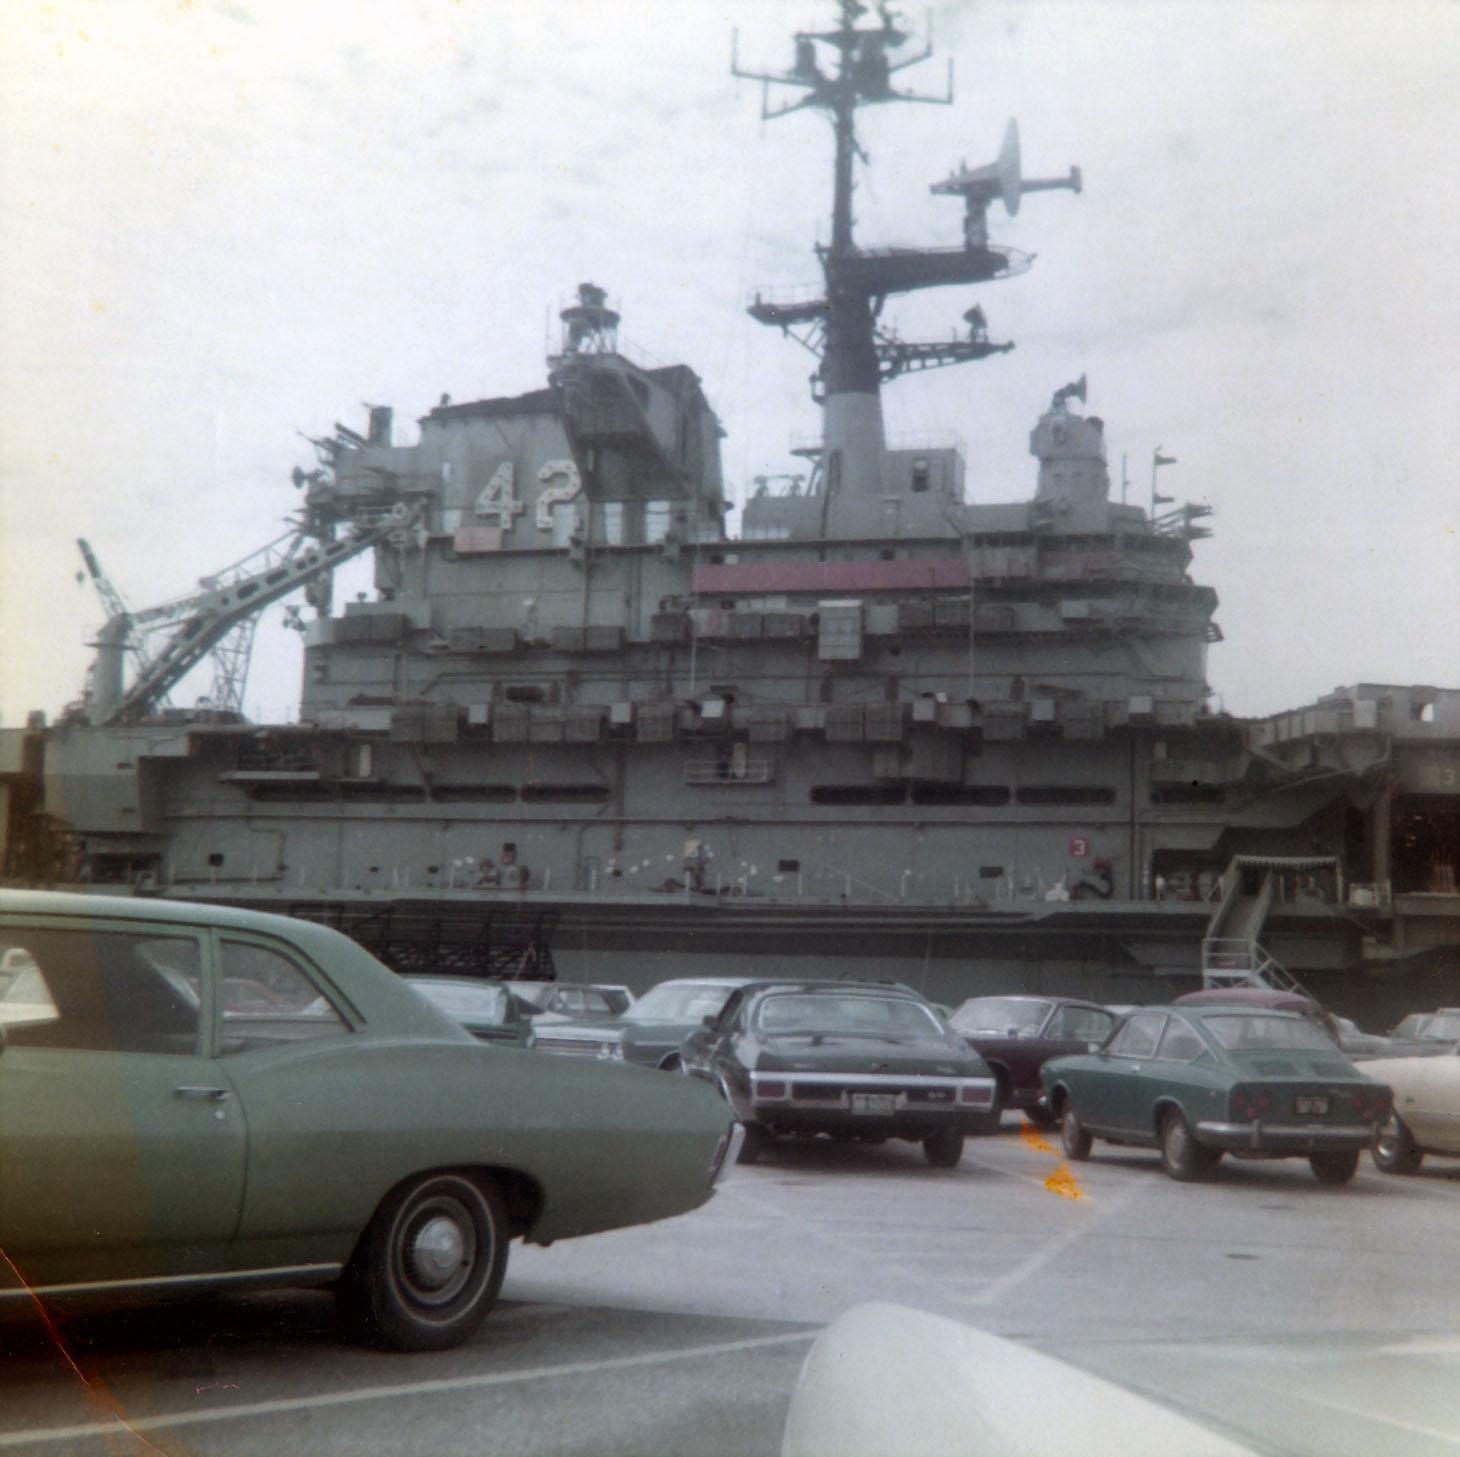 fdr-in-mayport-1971-w